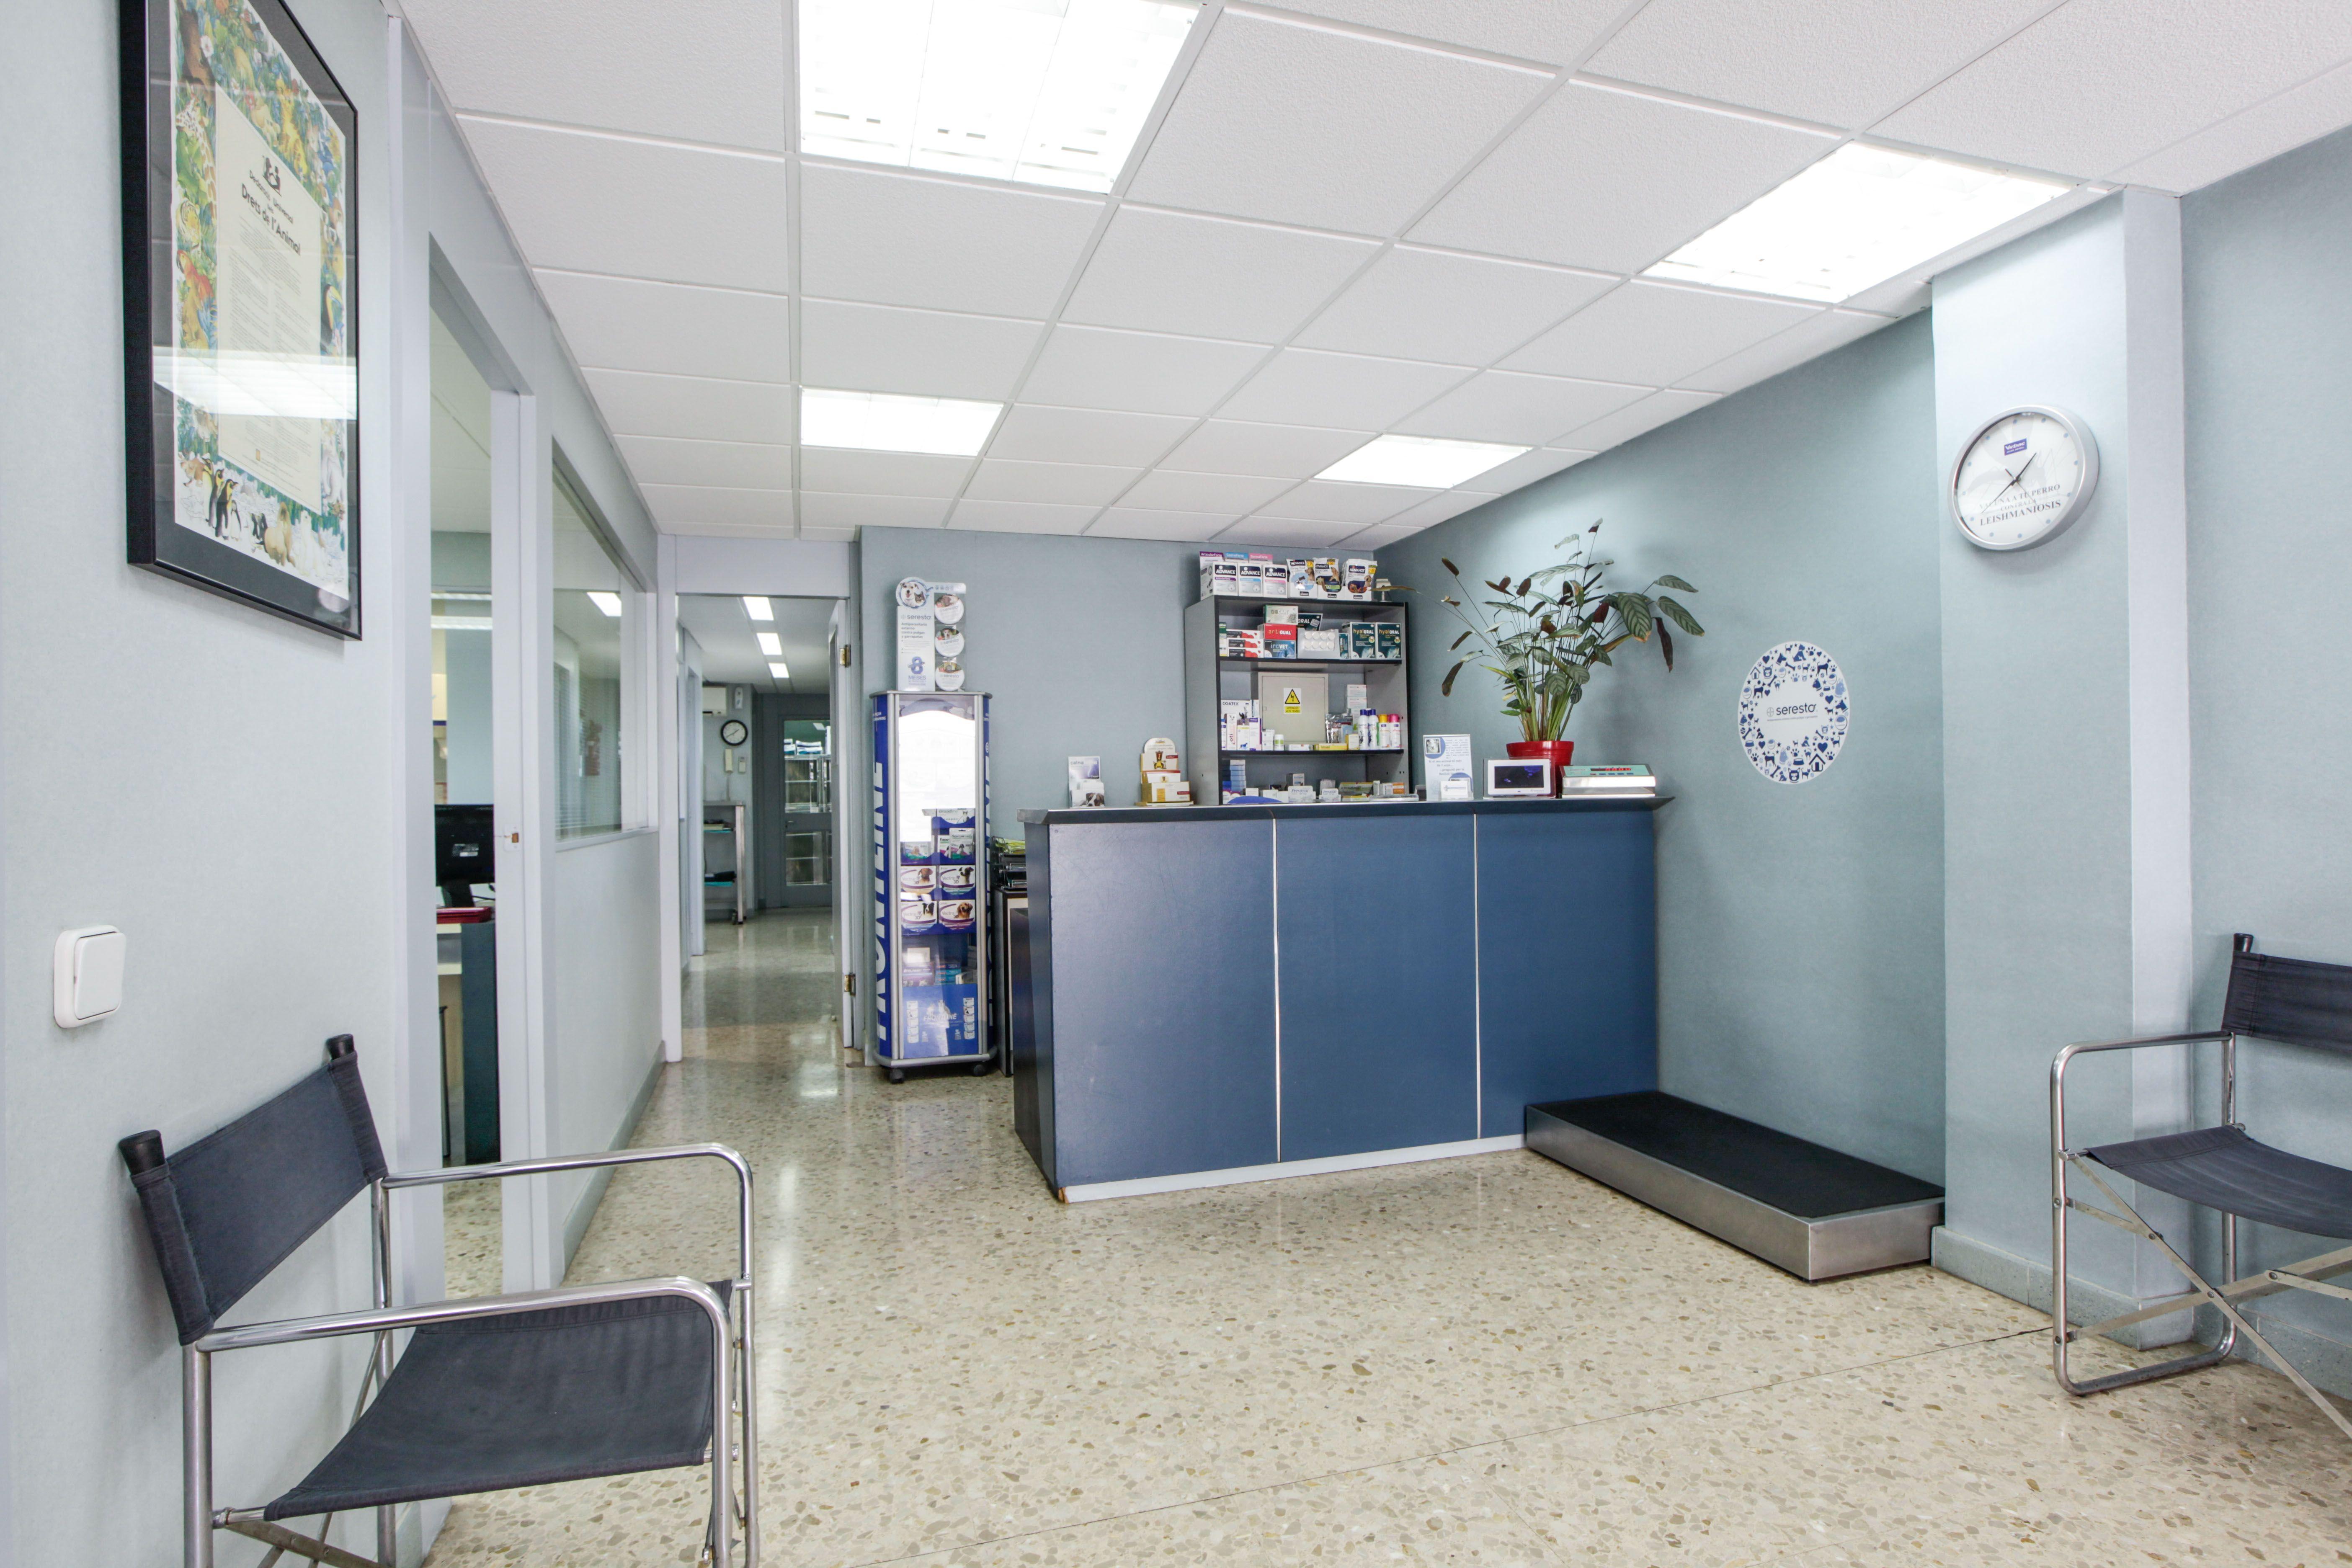 Foto 2 de Veterinarios en Sant Feliu de Llobregat | Centre Veterinari Lacueva Rodrigo